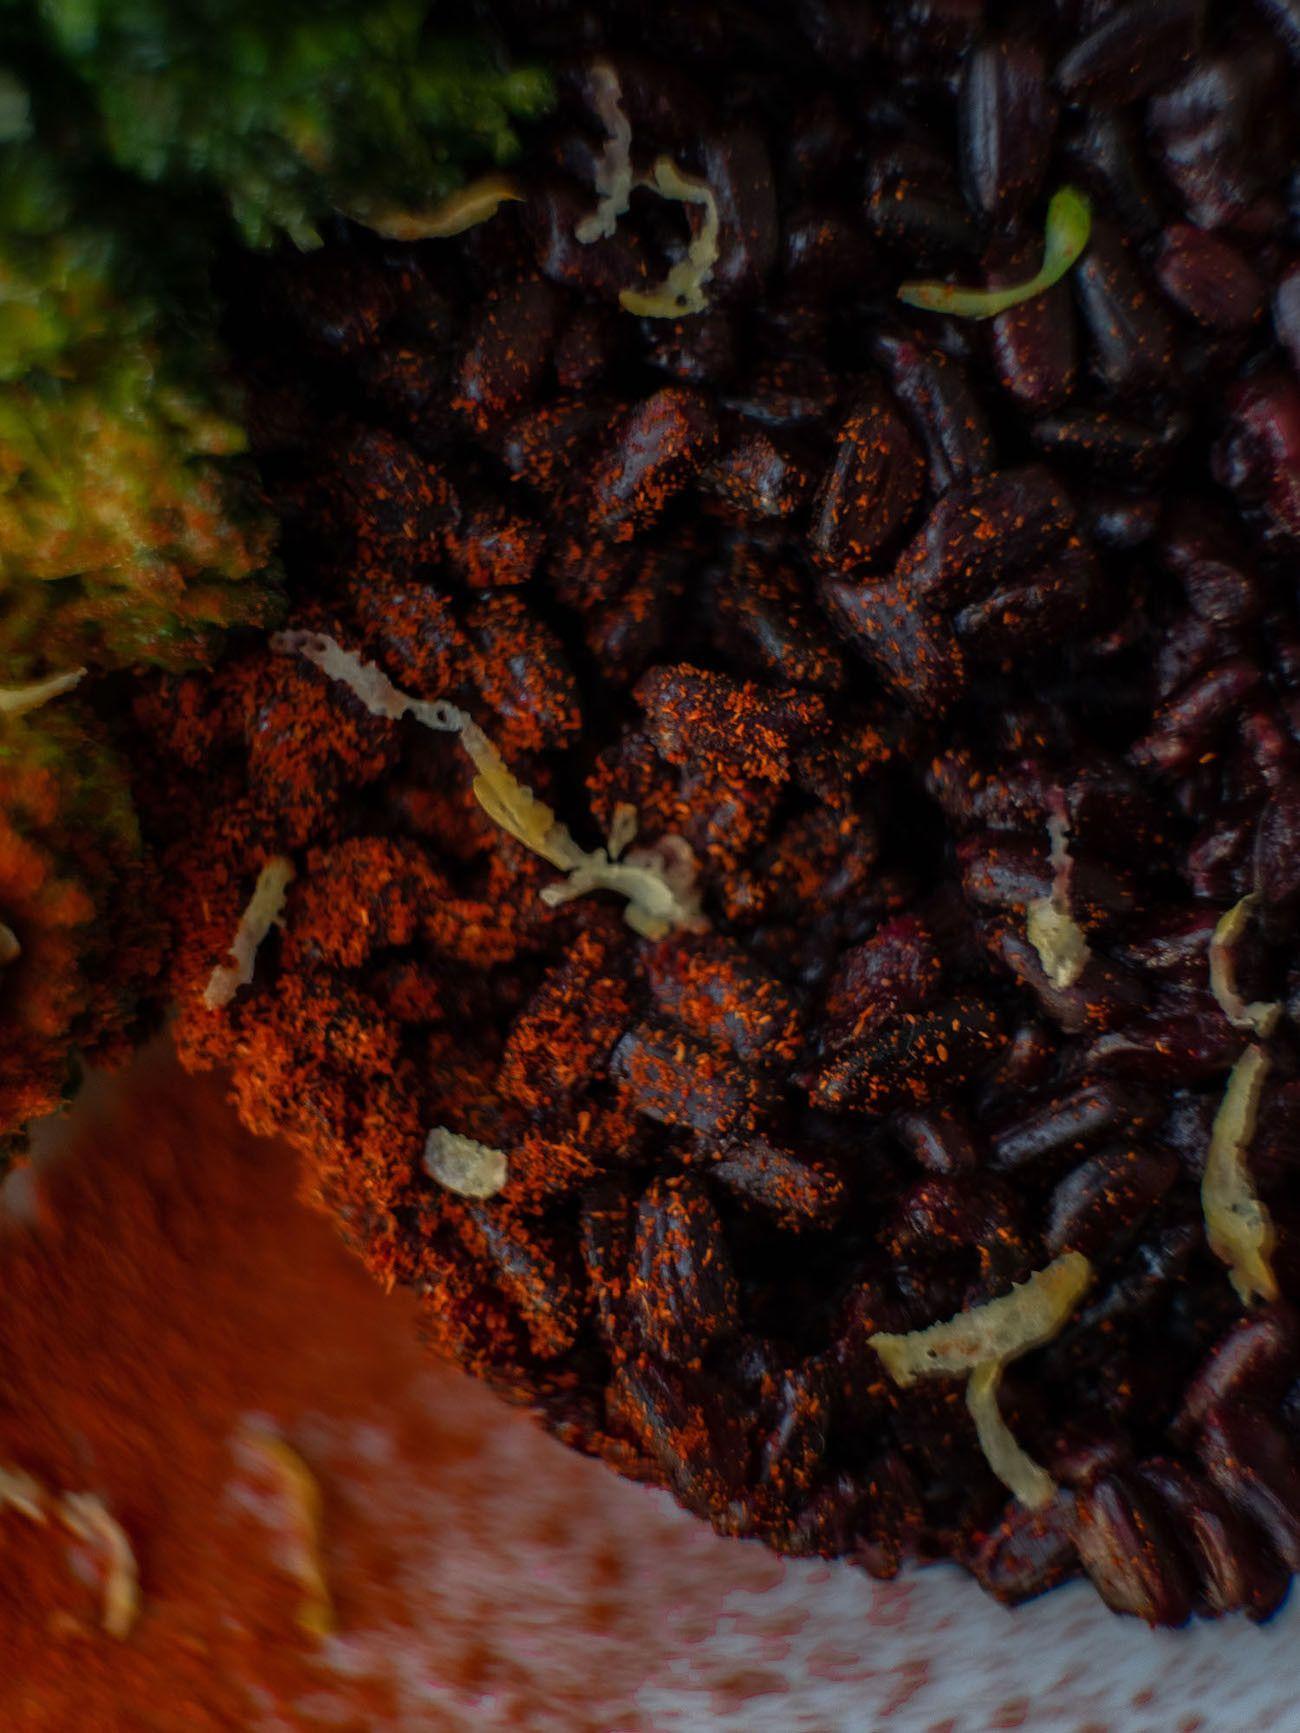 Foodblog, Rezept Kürbis Curry Püree mit zitronen Brokkoli und schwarzem Reis, Paprikapulver, Close Up_1